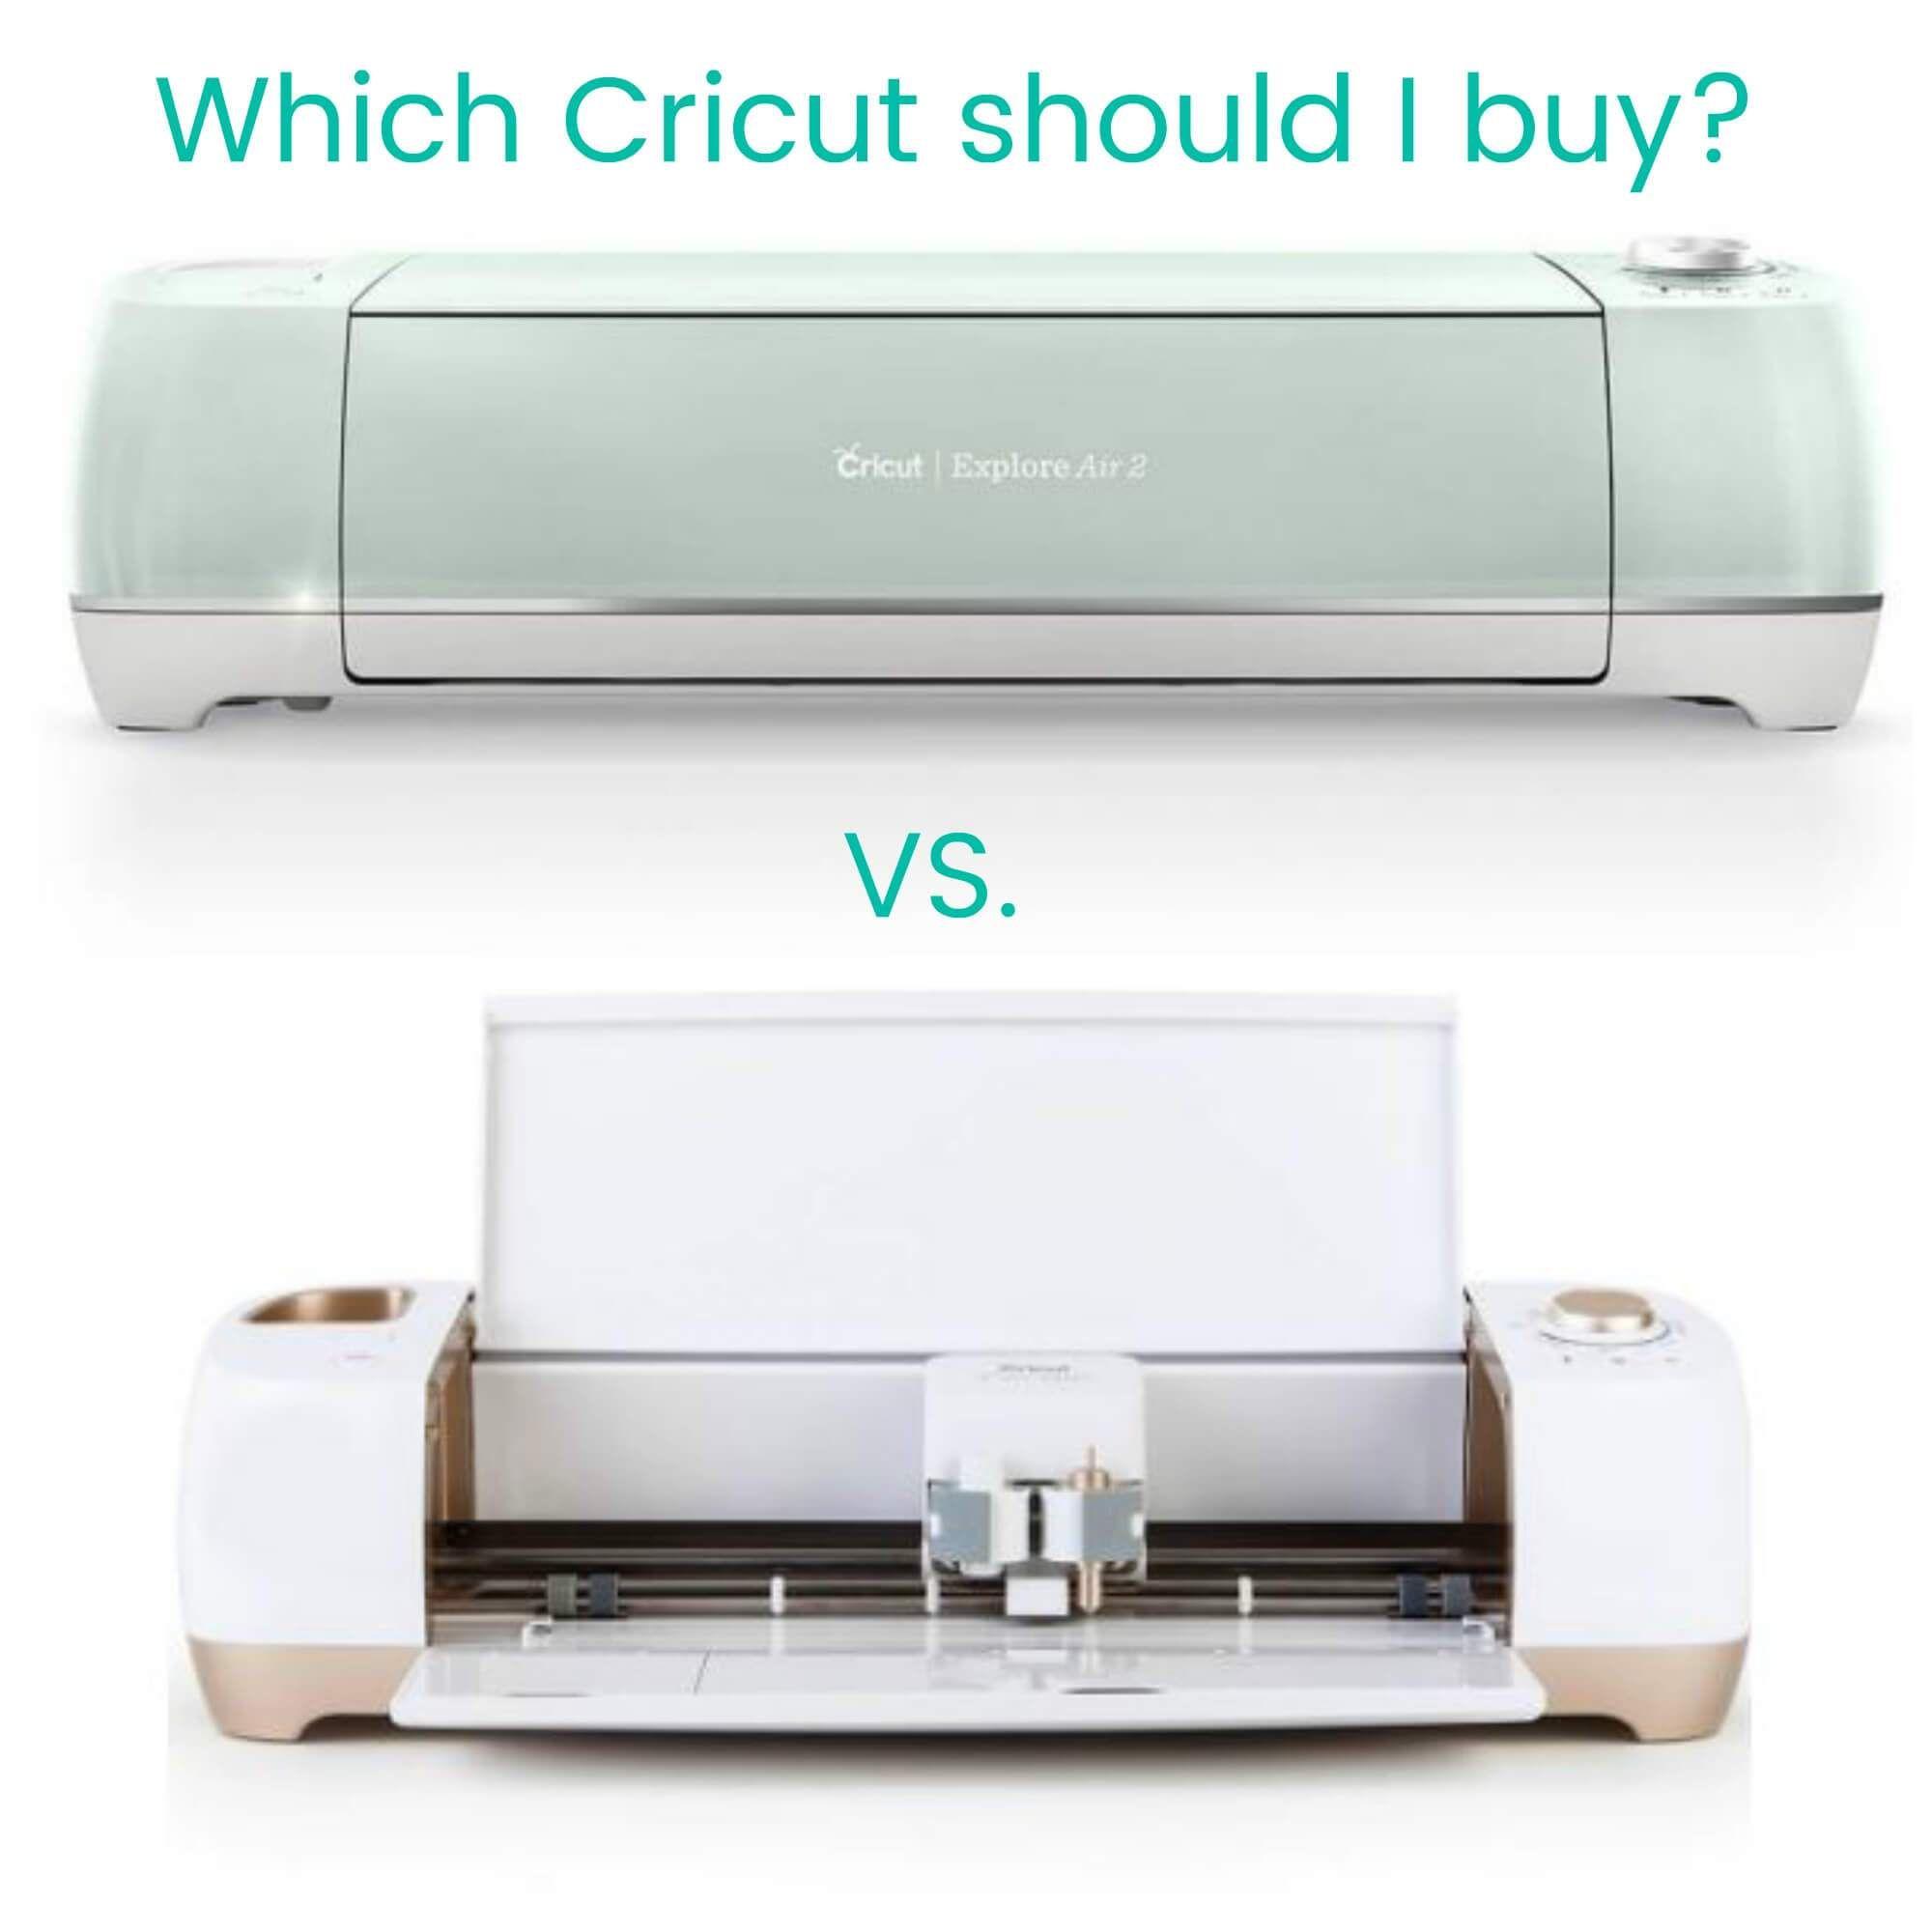 Cricut Maker vs Cricut Explore Air 2 Differences to know